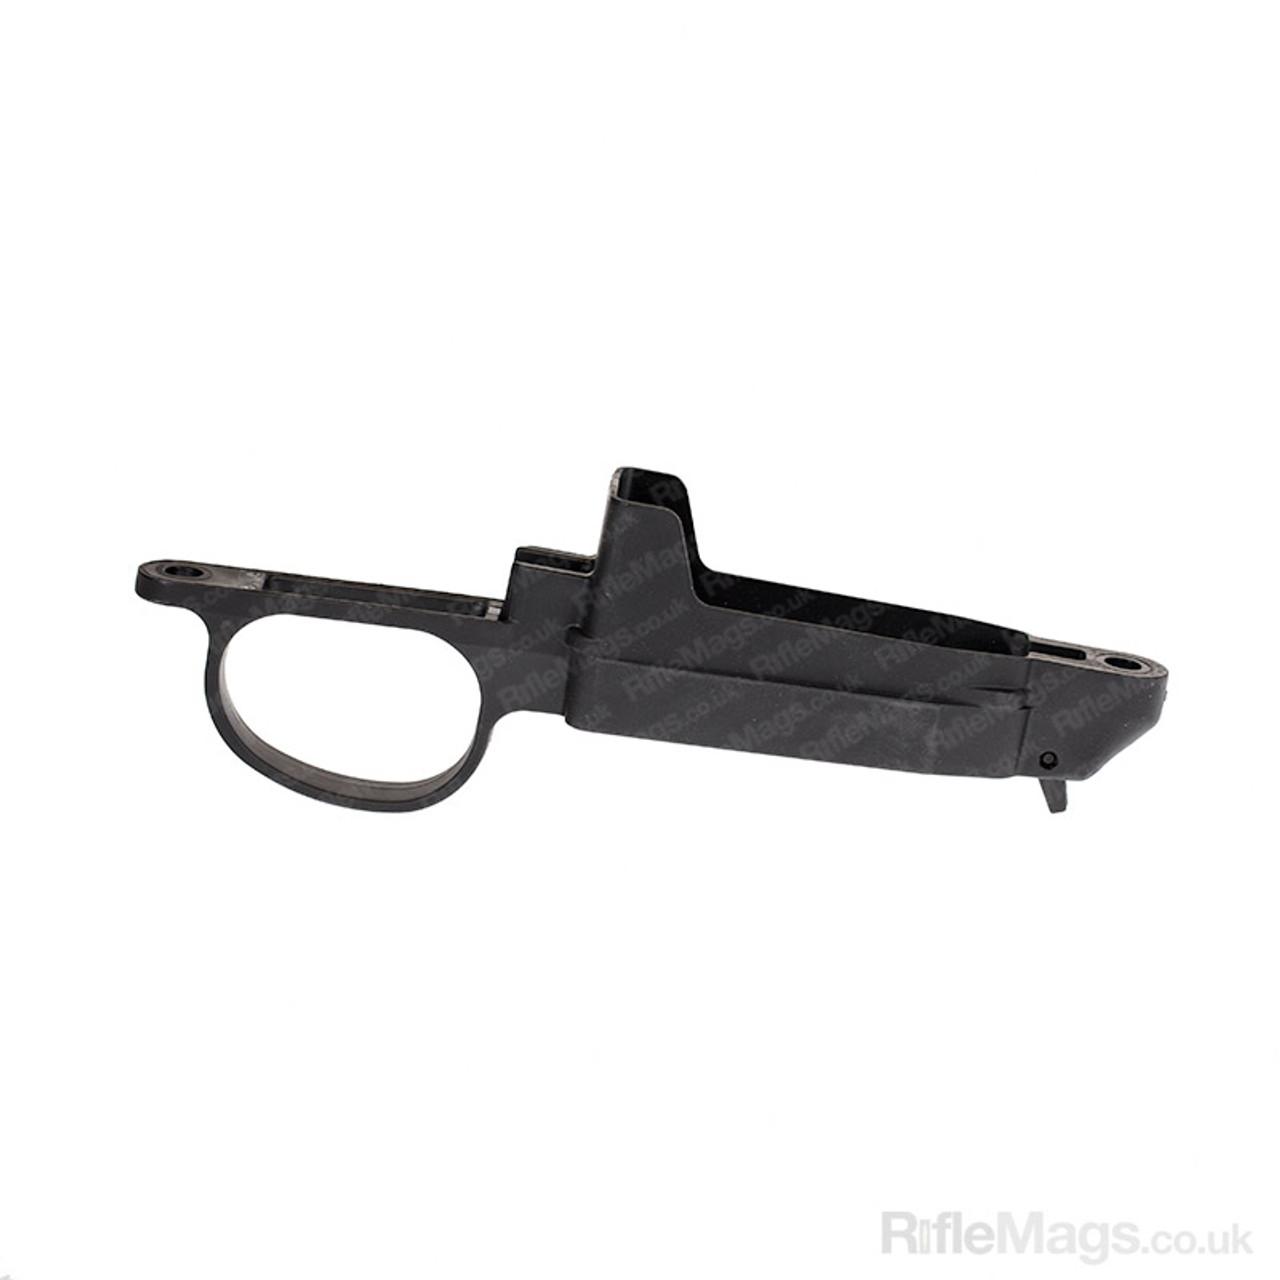 ATI Magazine Floorplate Conversion for Remington 700 Short Action